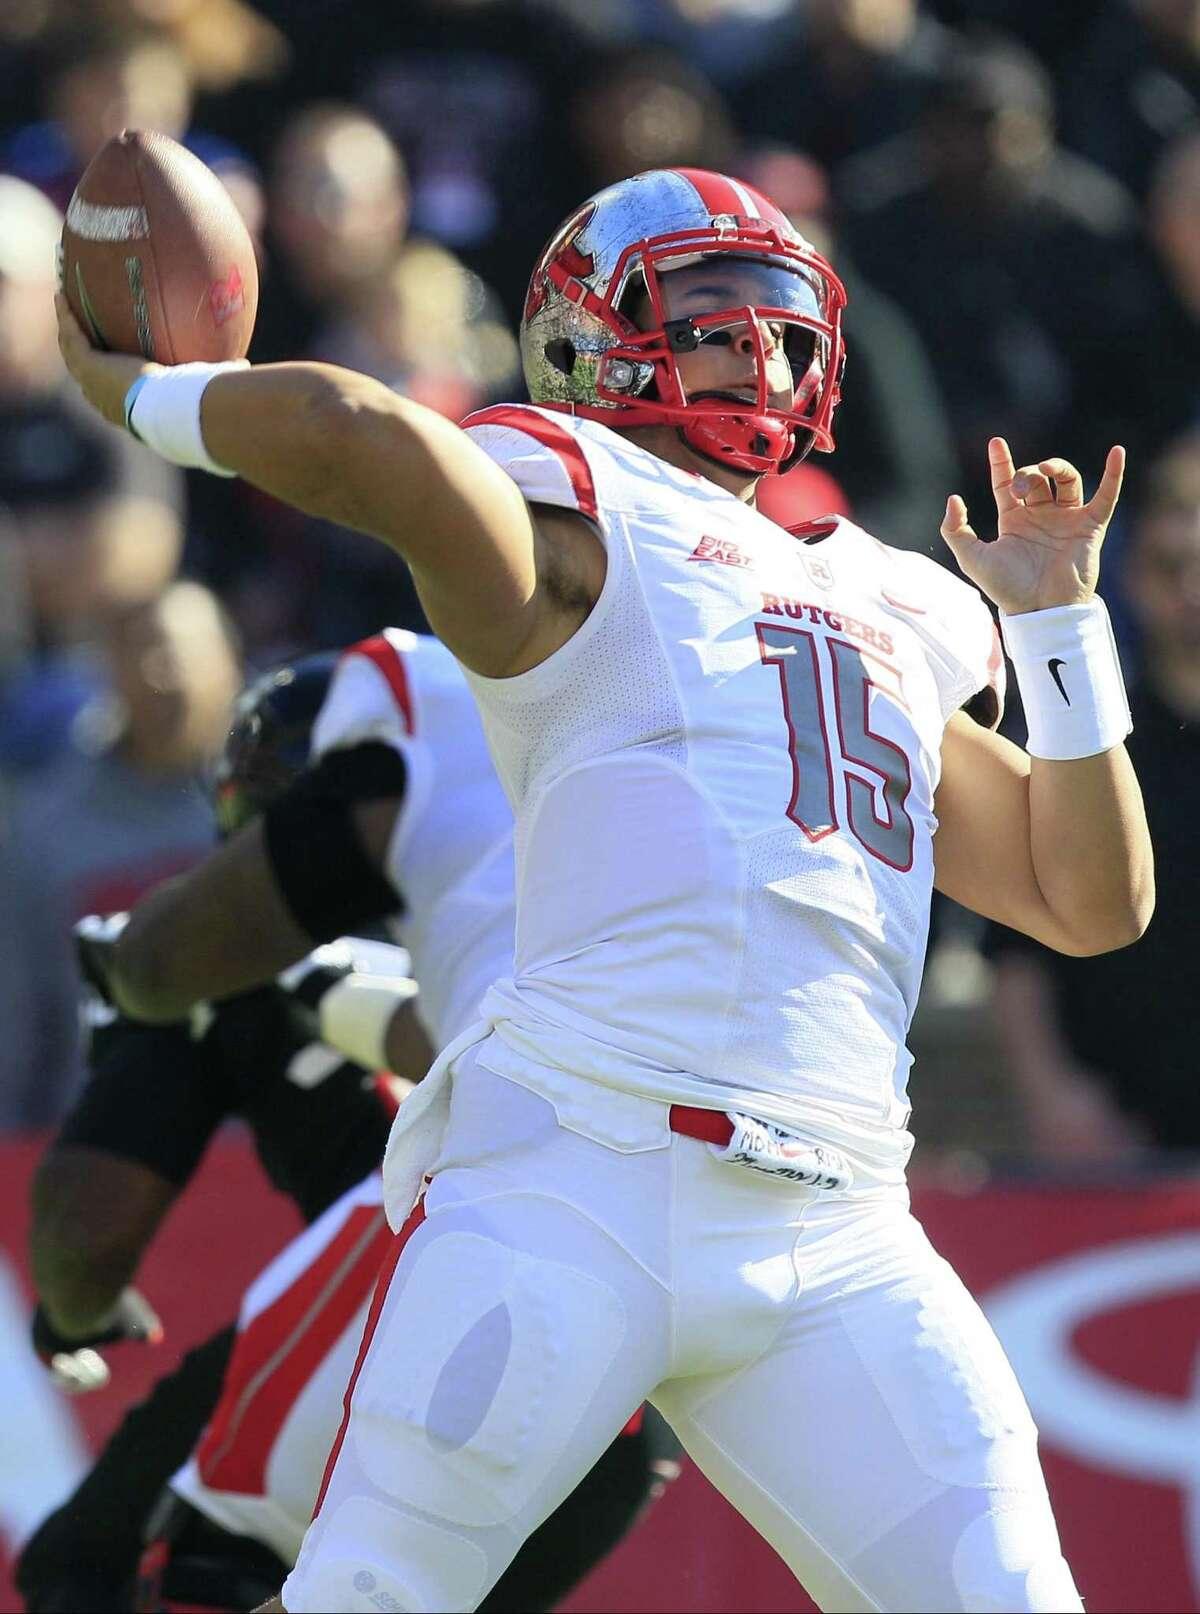 Rutgers quarterback Gary Nova in action against Cincinnati Saturday, Nov. 1.